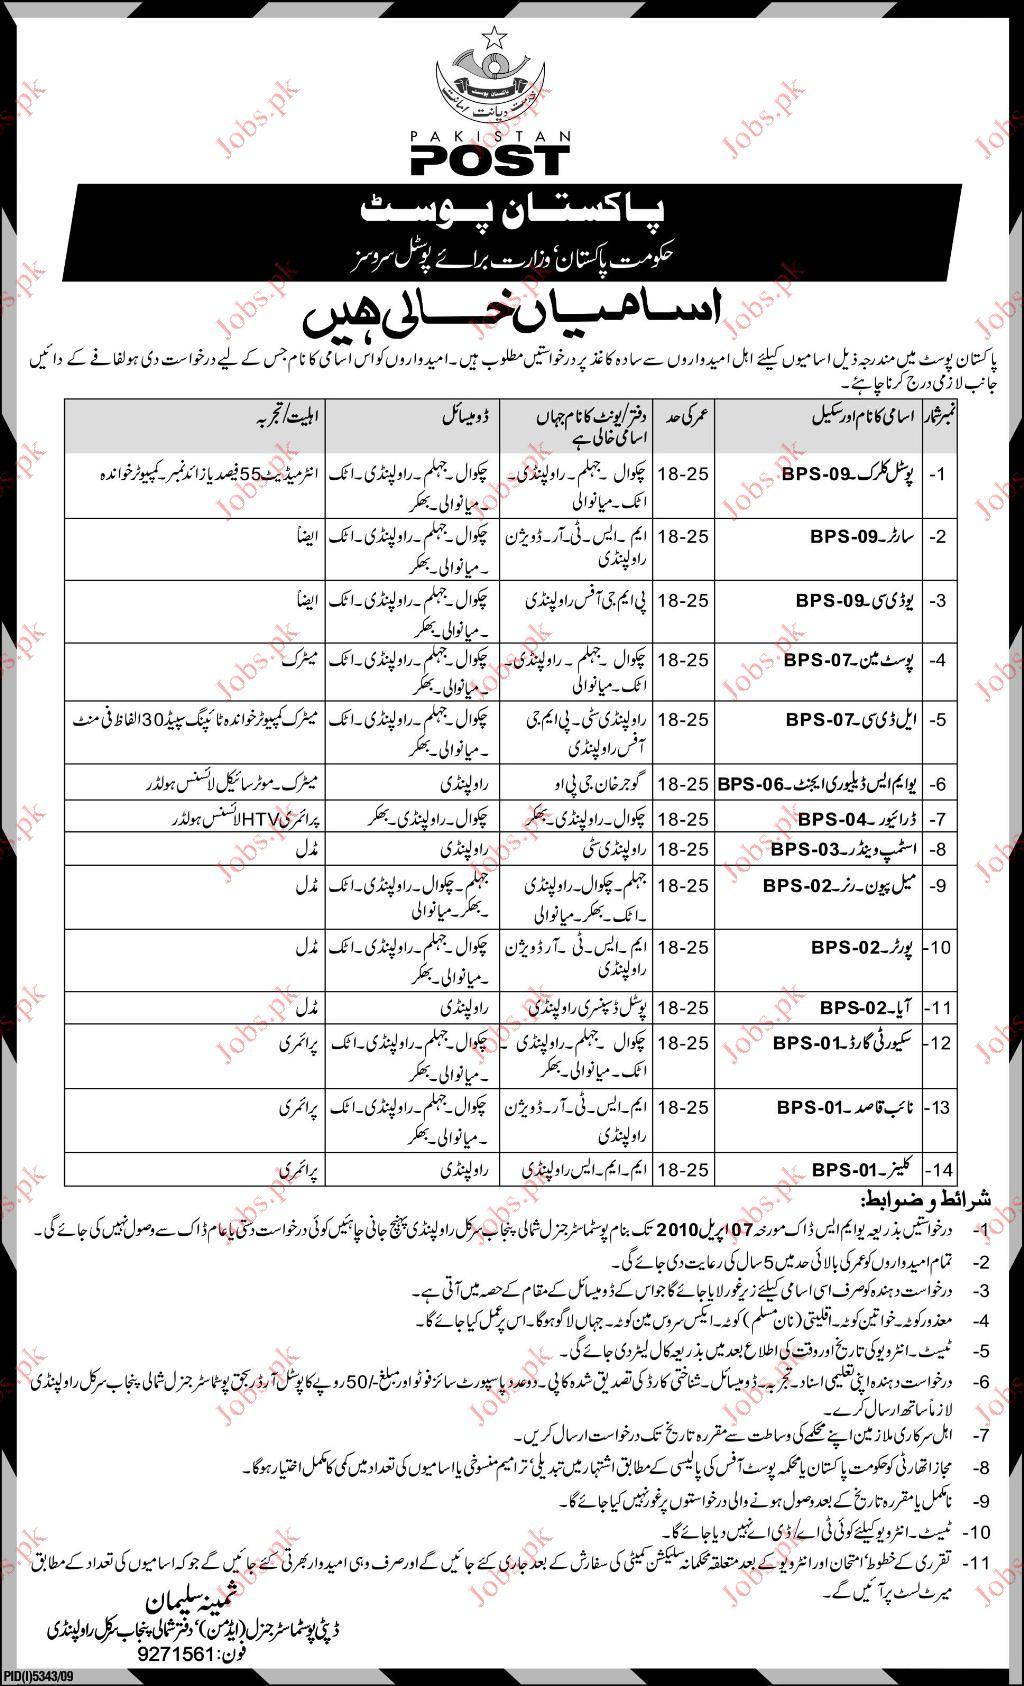 Pakistan Post Job Opportunities